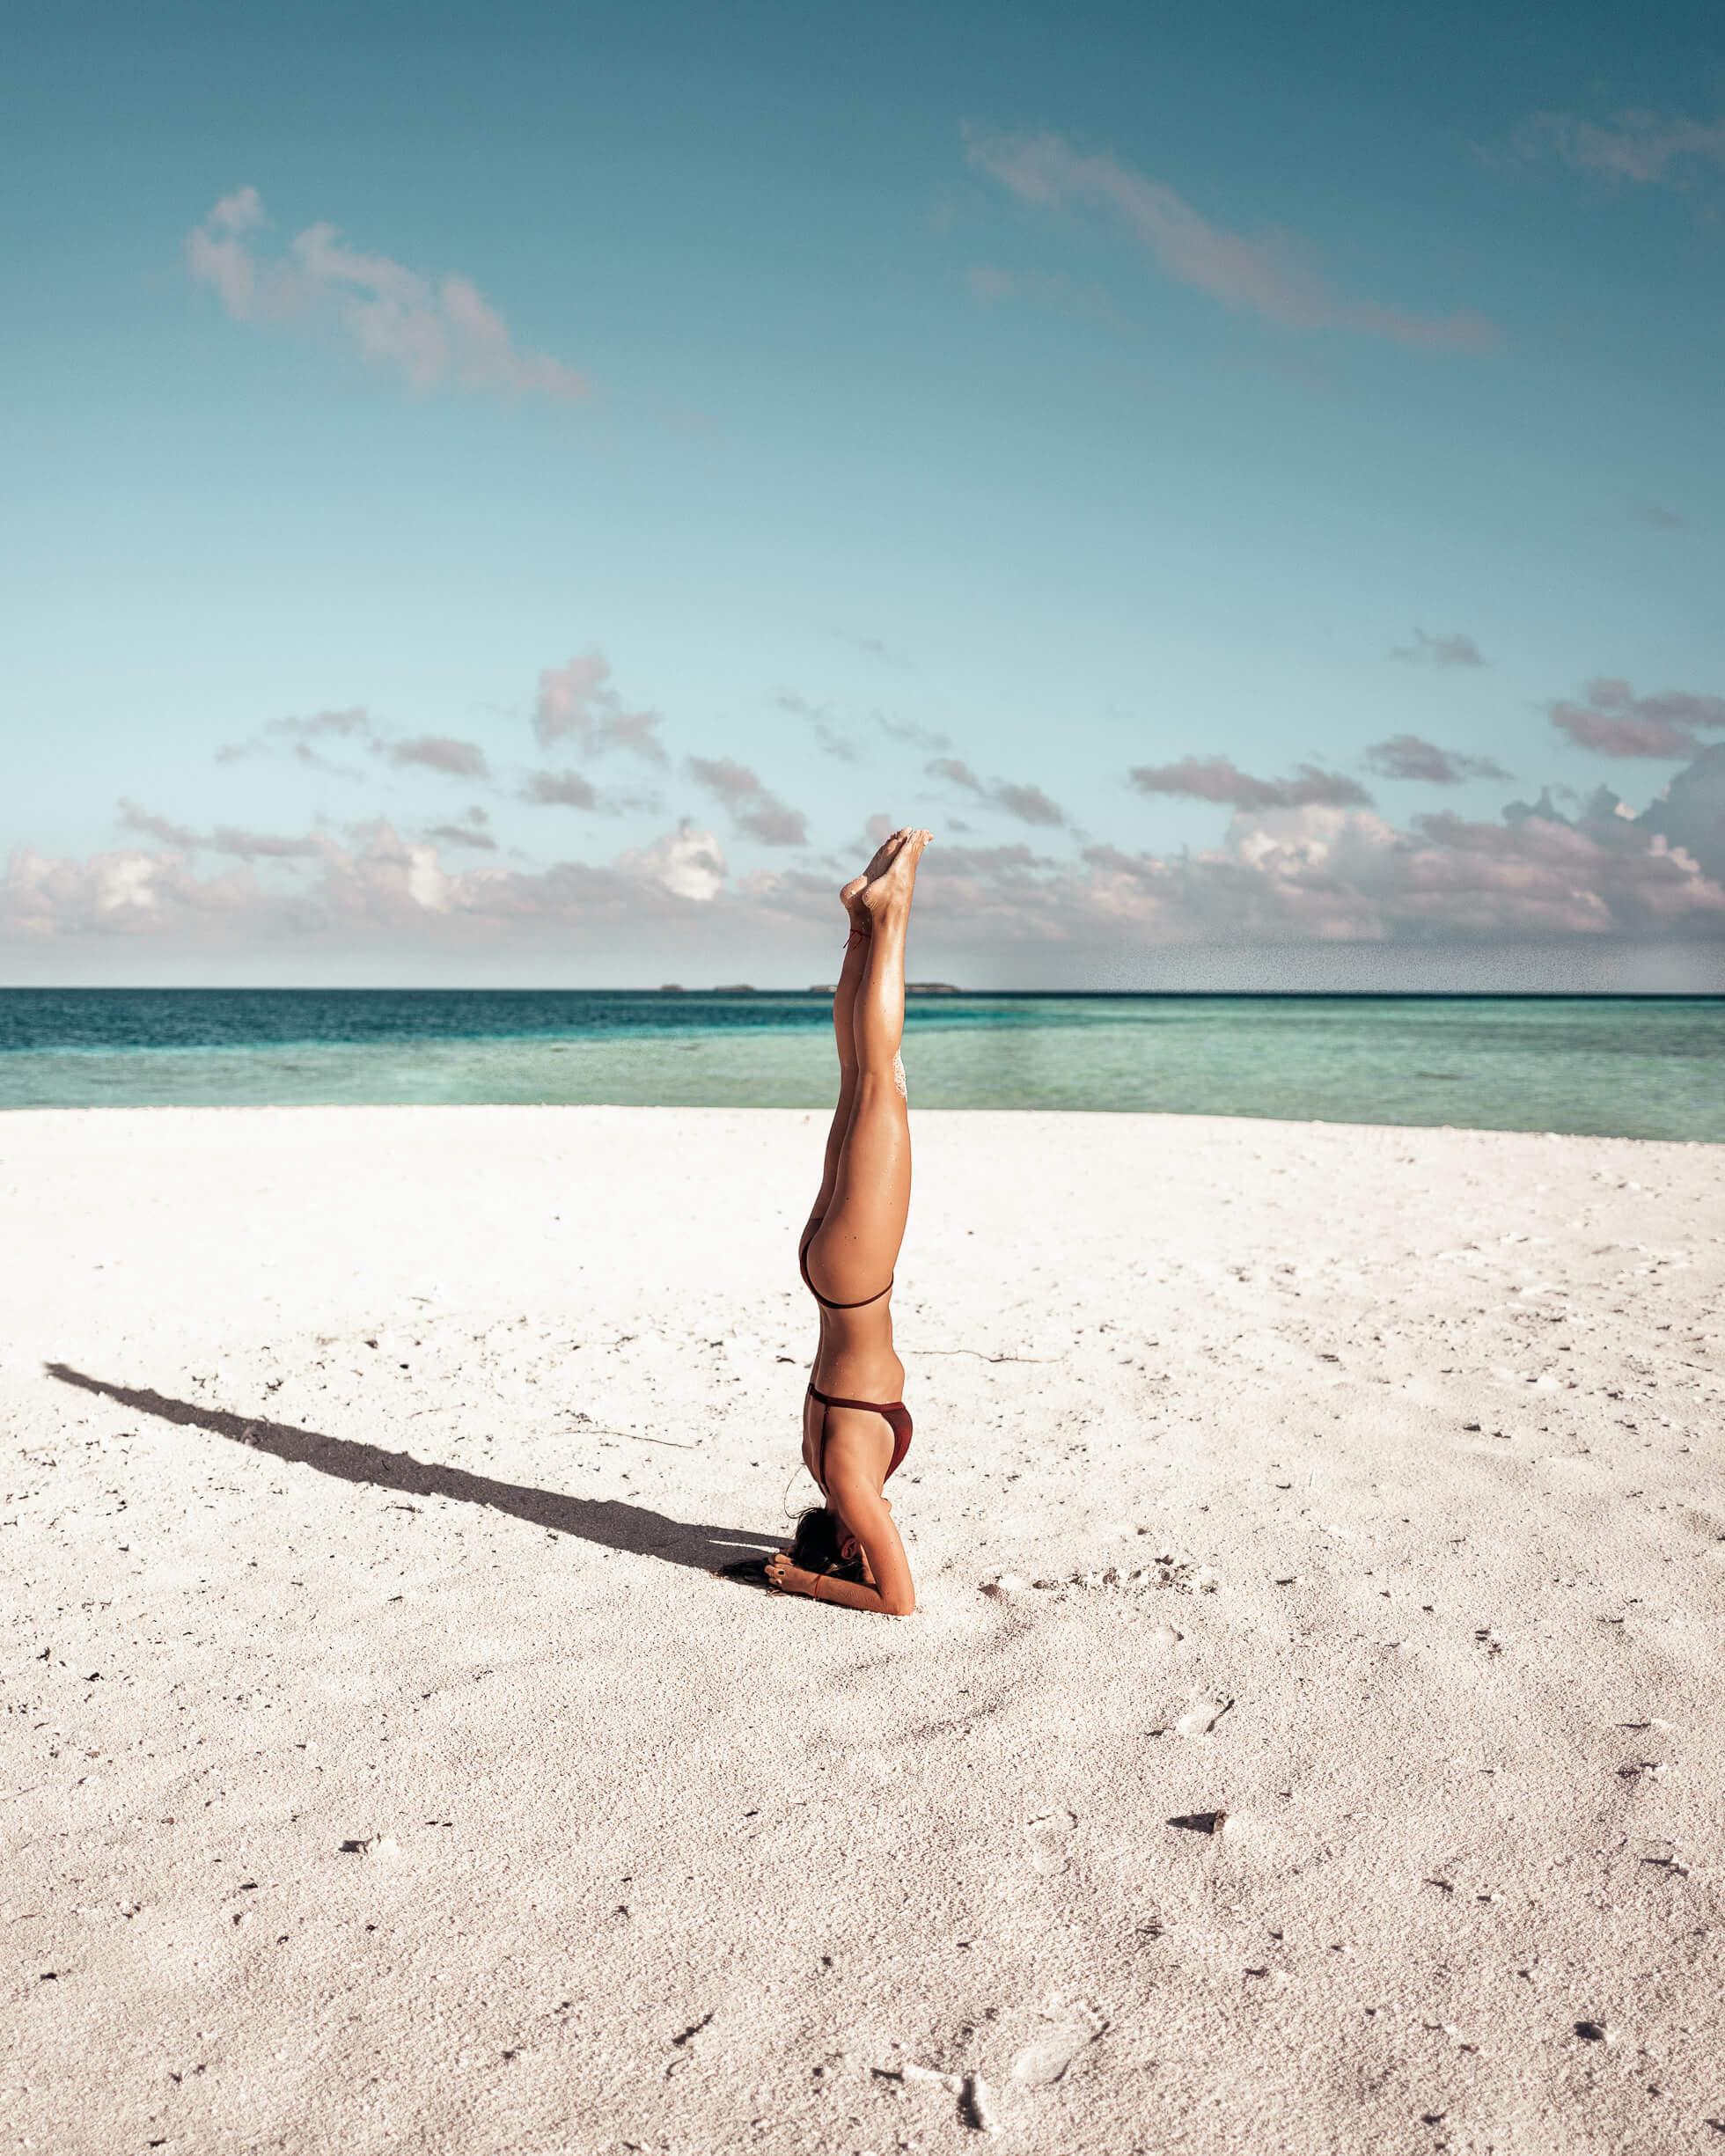 janni-deler-maldives-momentsl1140099-redigera